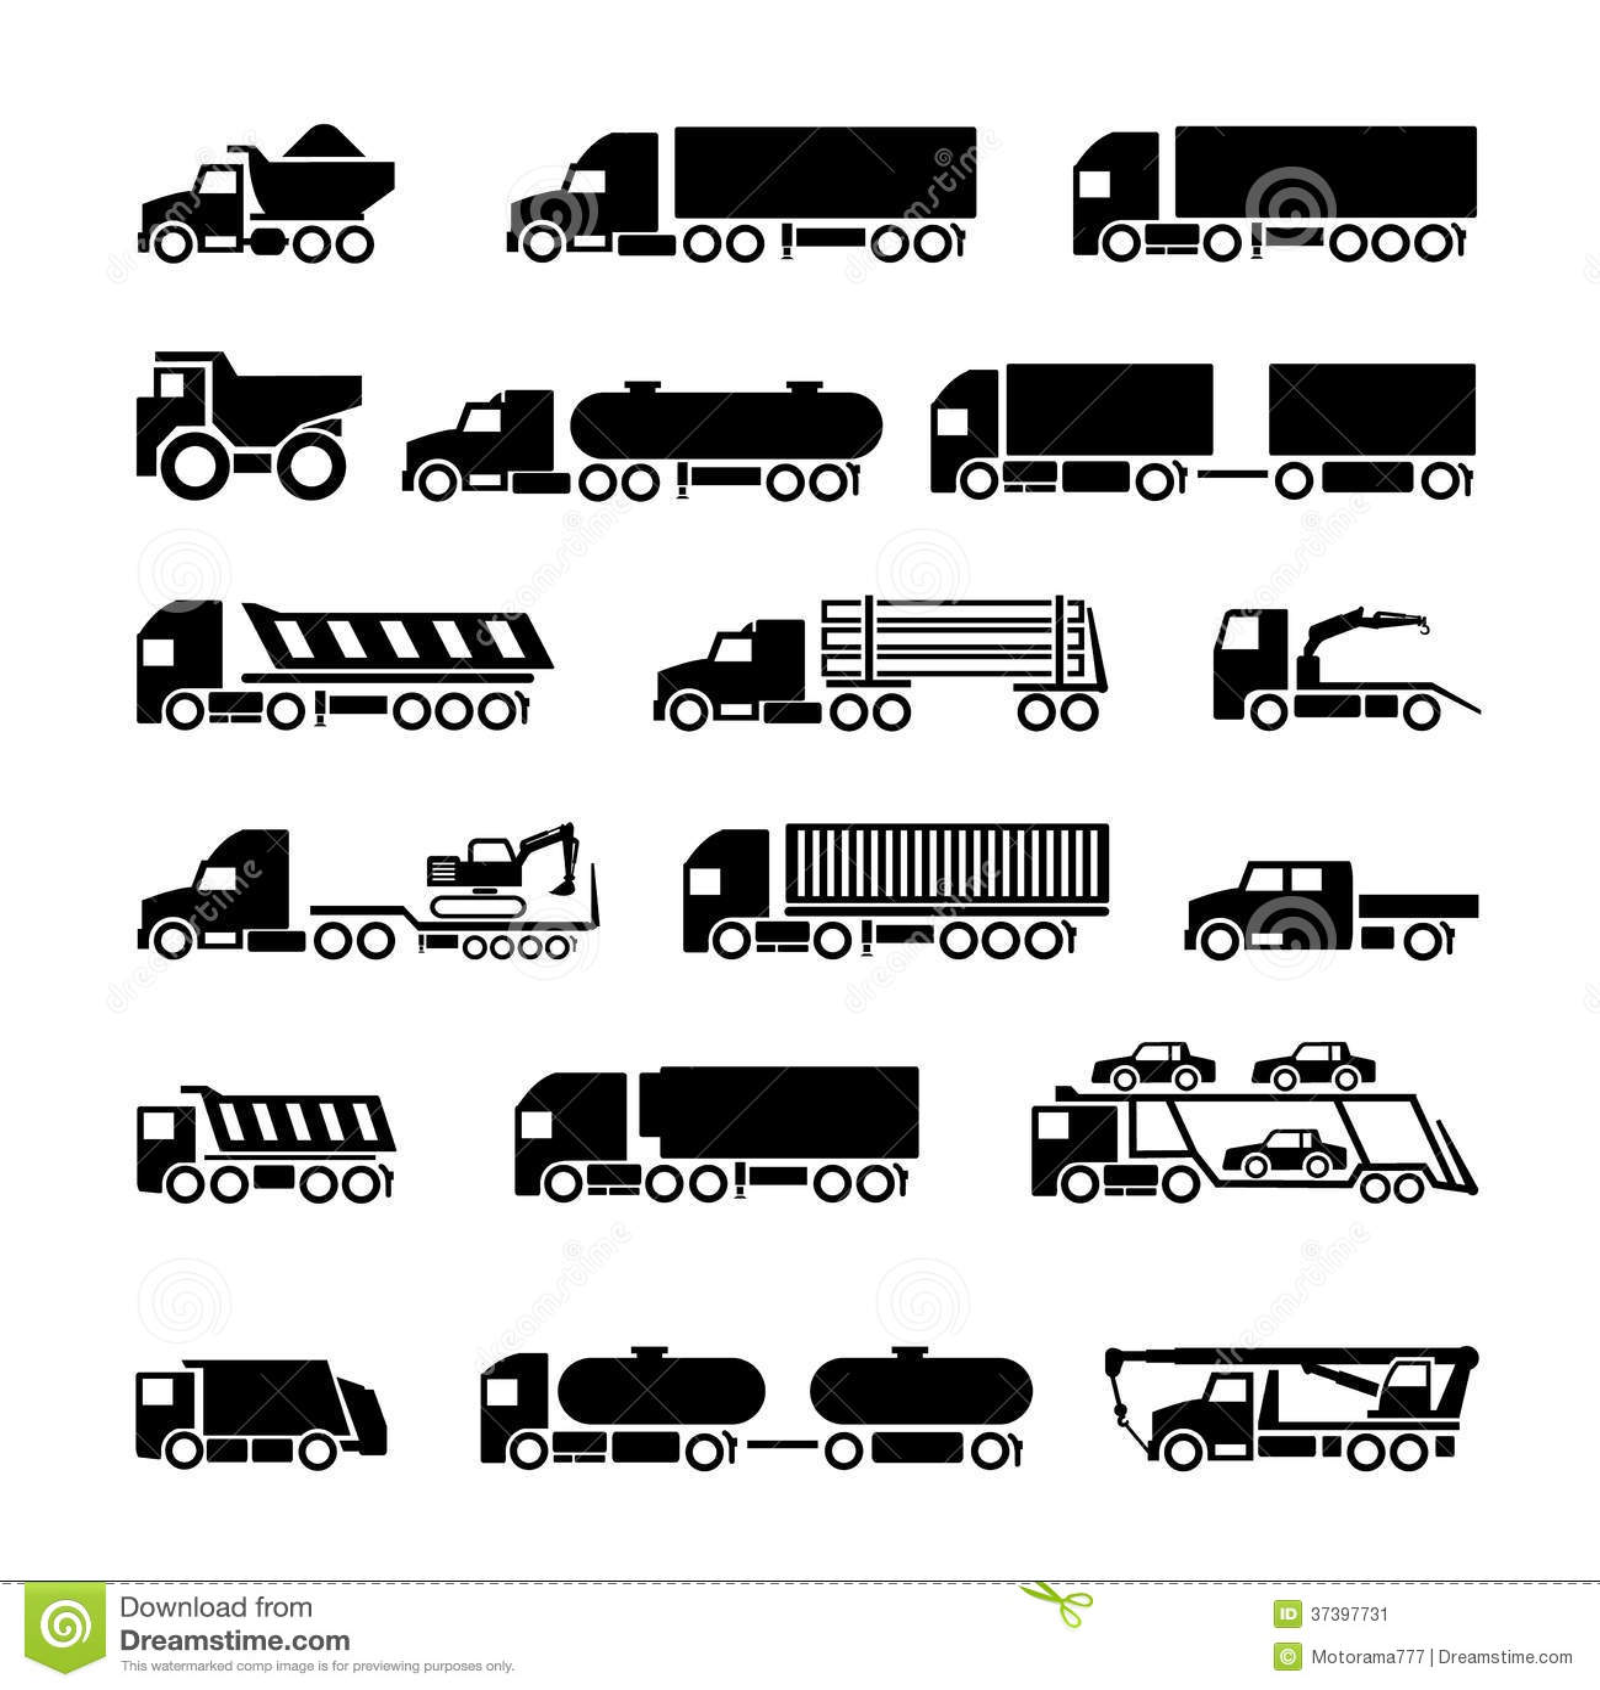 Diagrams Wiring Civil Engineering Symbols